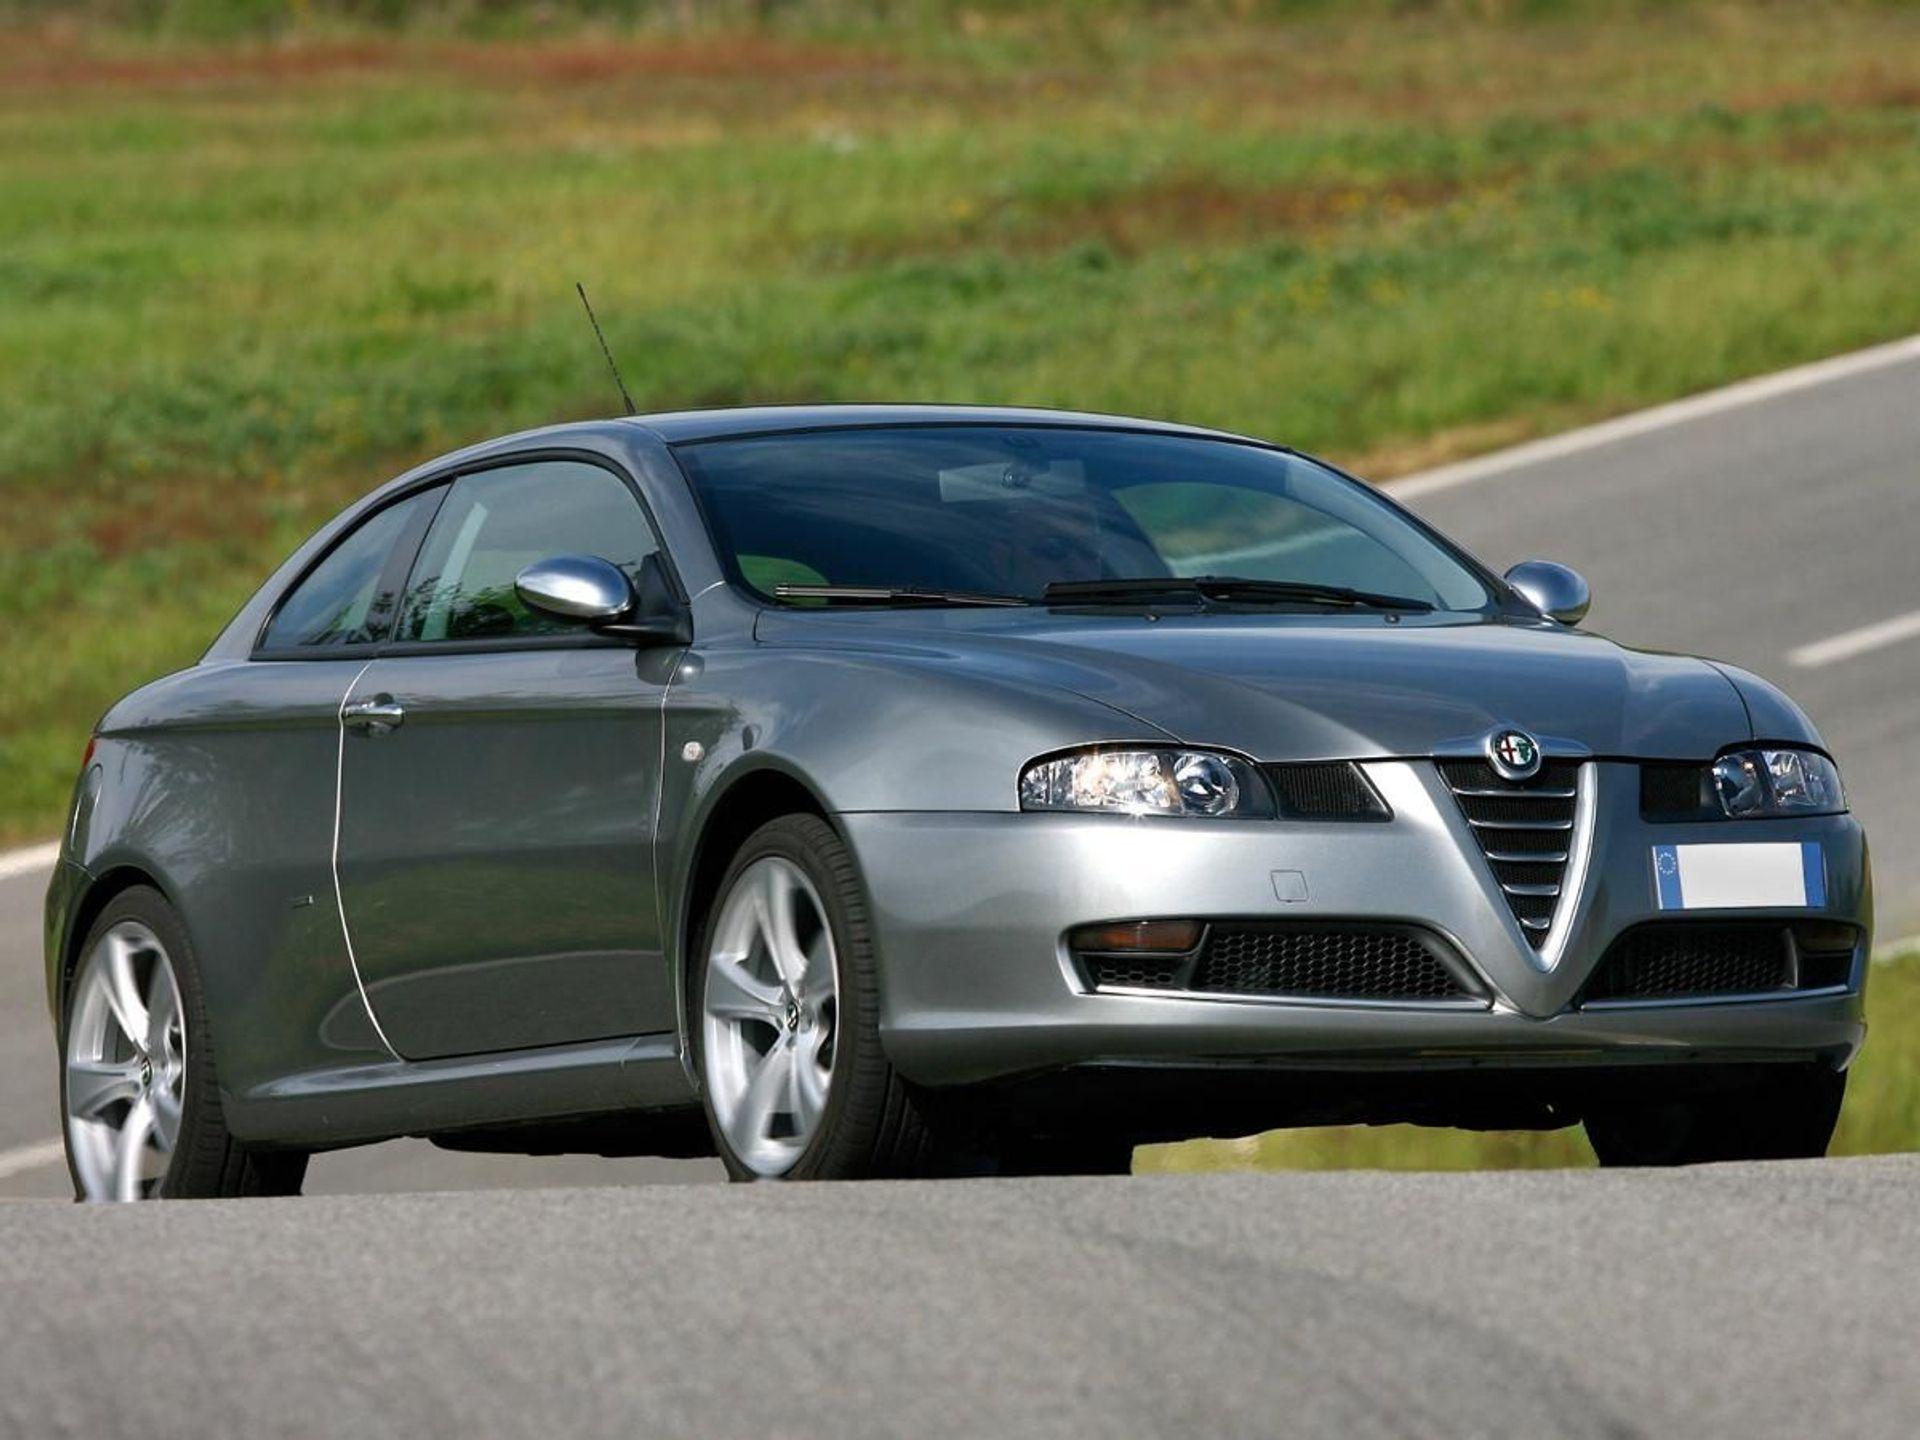 Alfa Romeo GT Lusso image